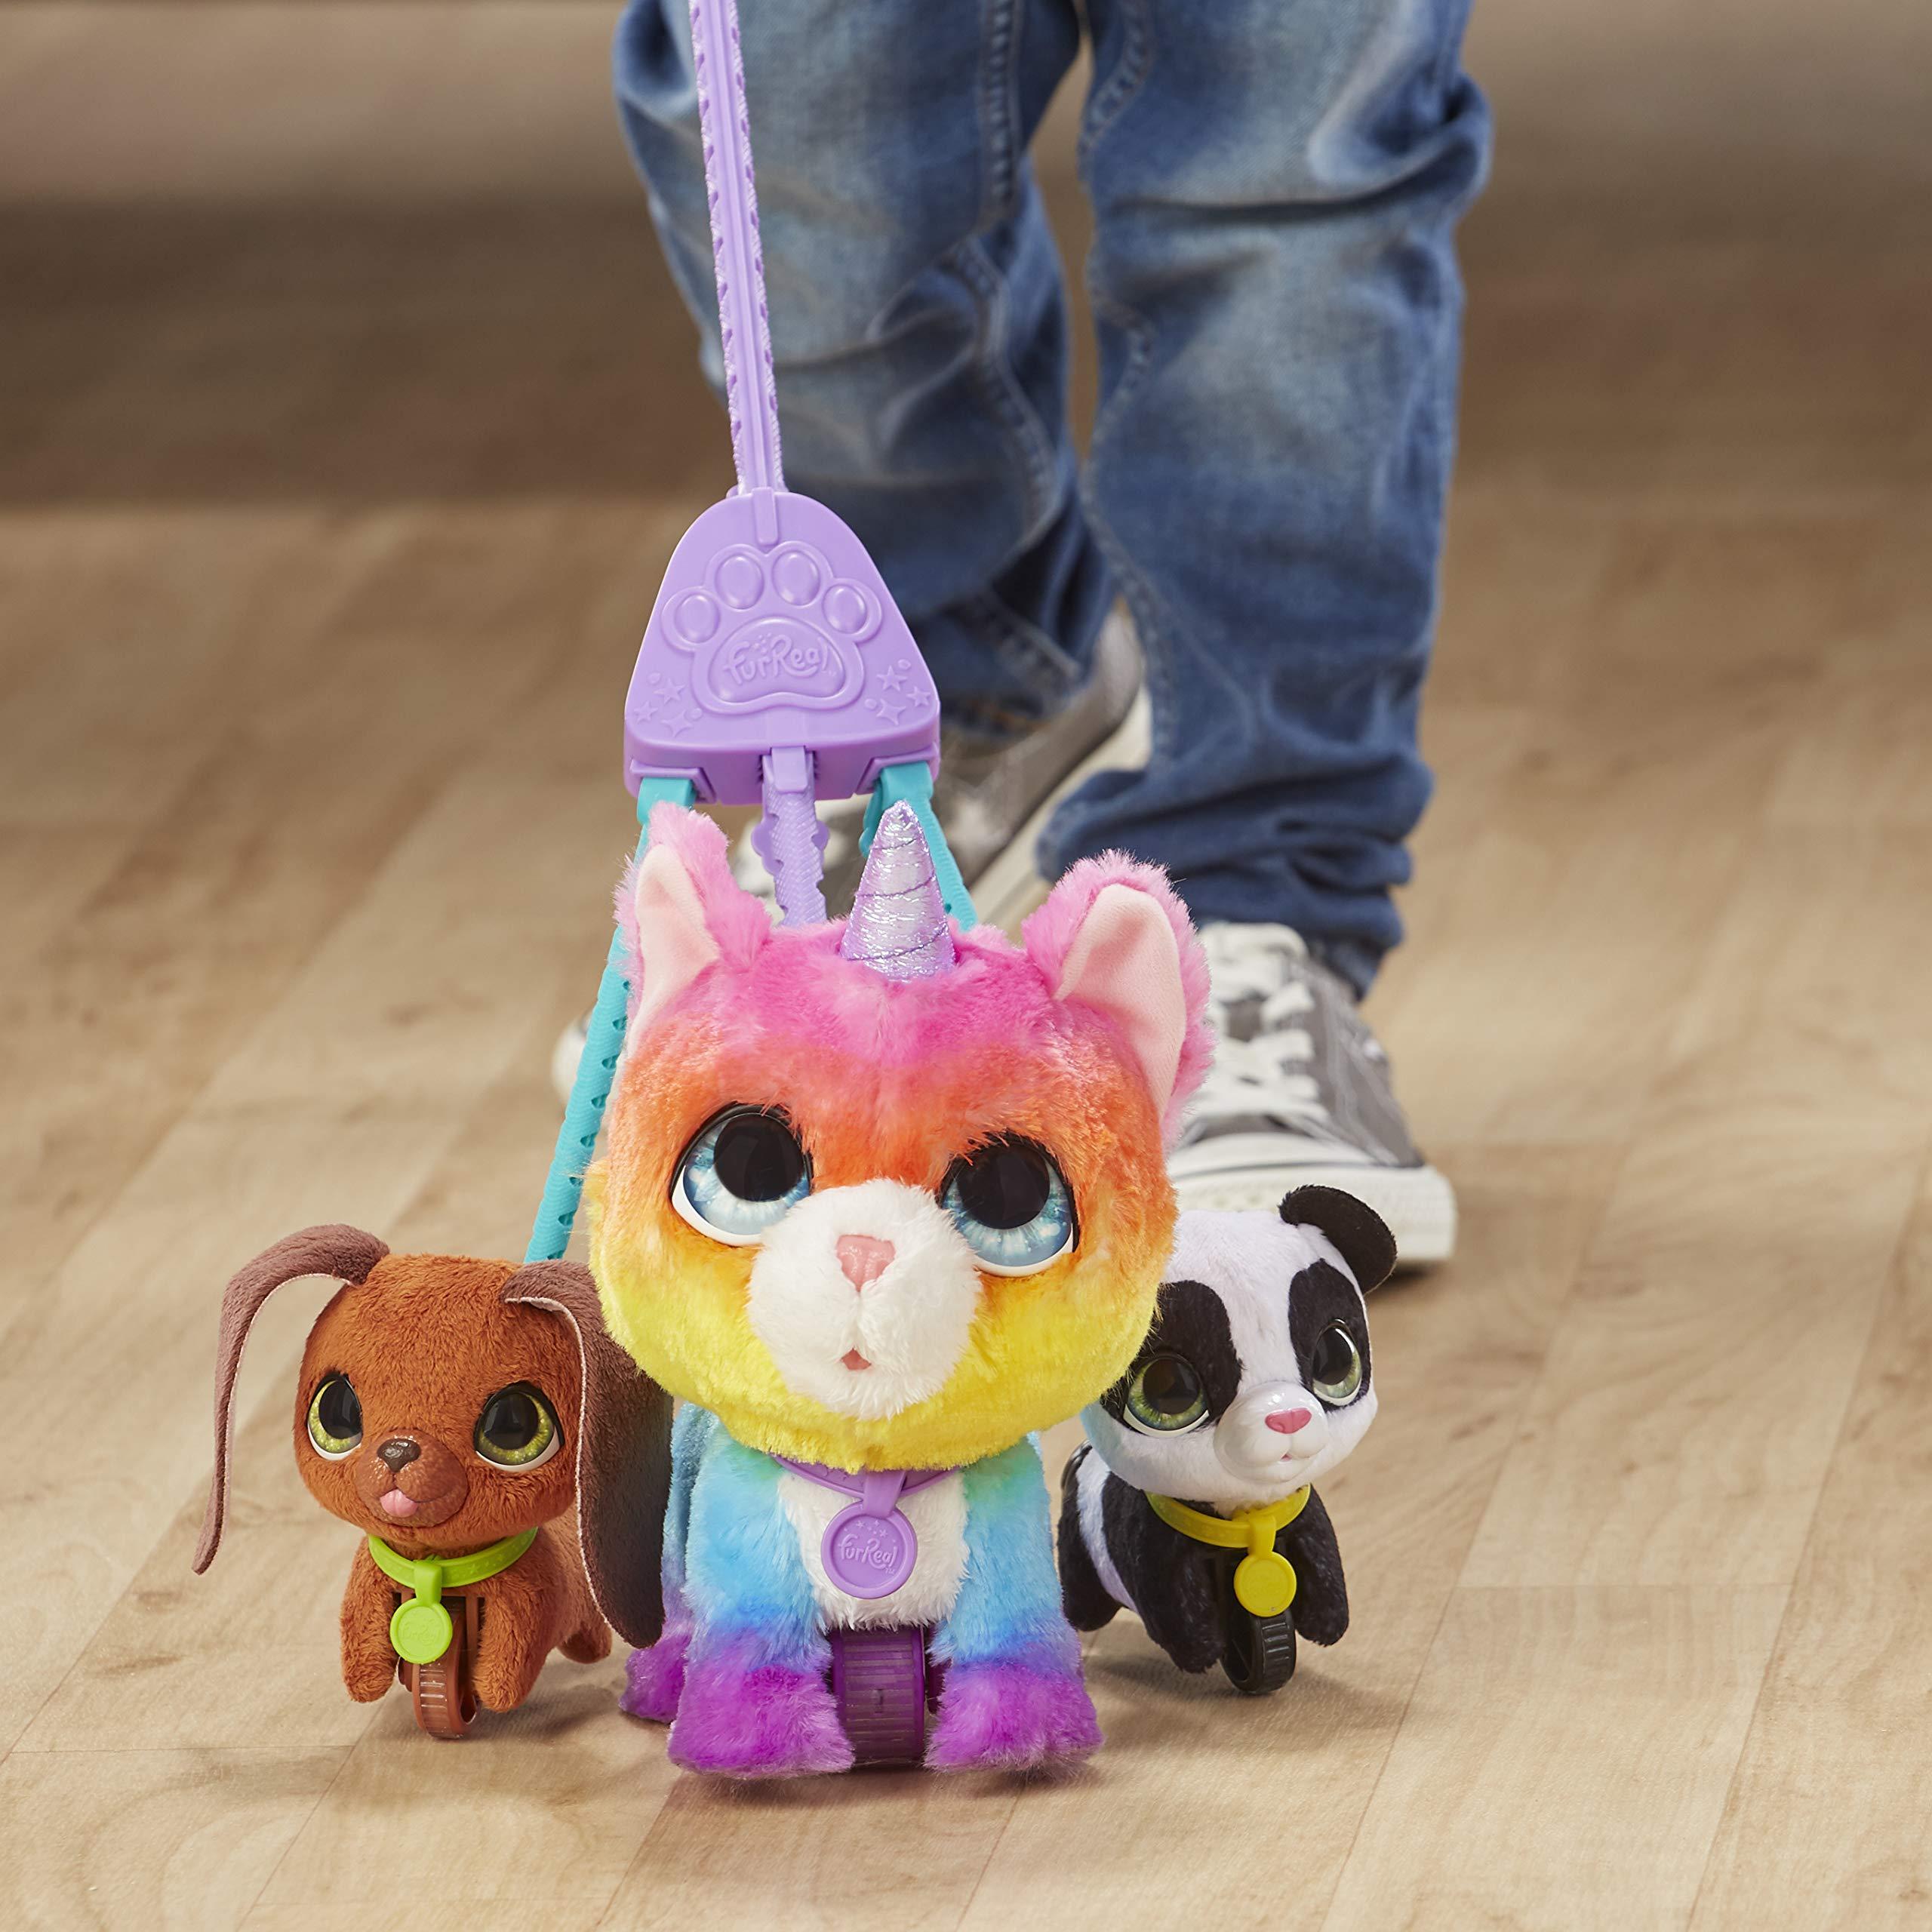 FurReal Friends E5307EU5 FRR WALKALOTS Big Wags Unicorn CAT, Multicolour by FurReal (Image #8)